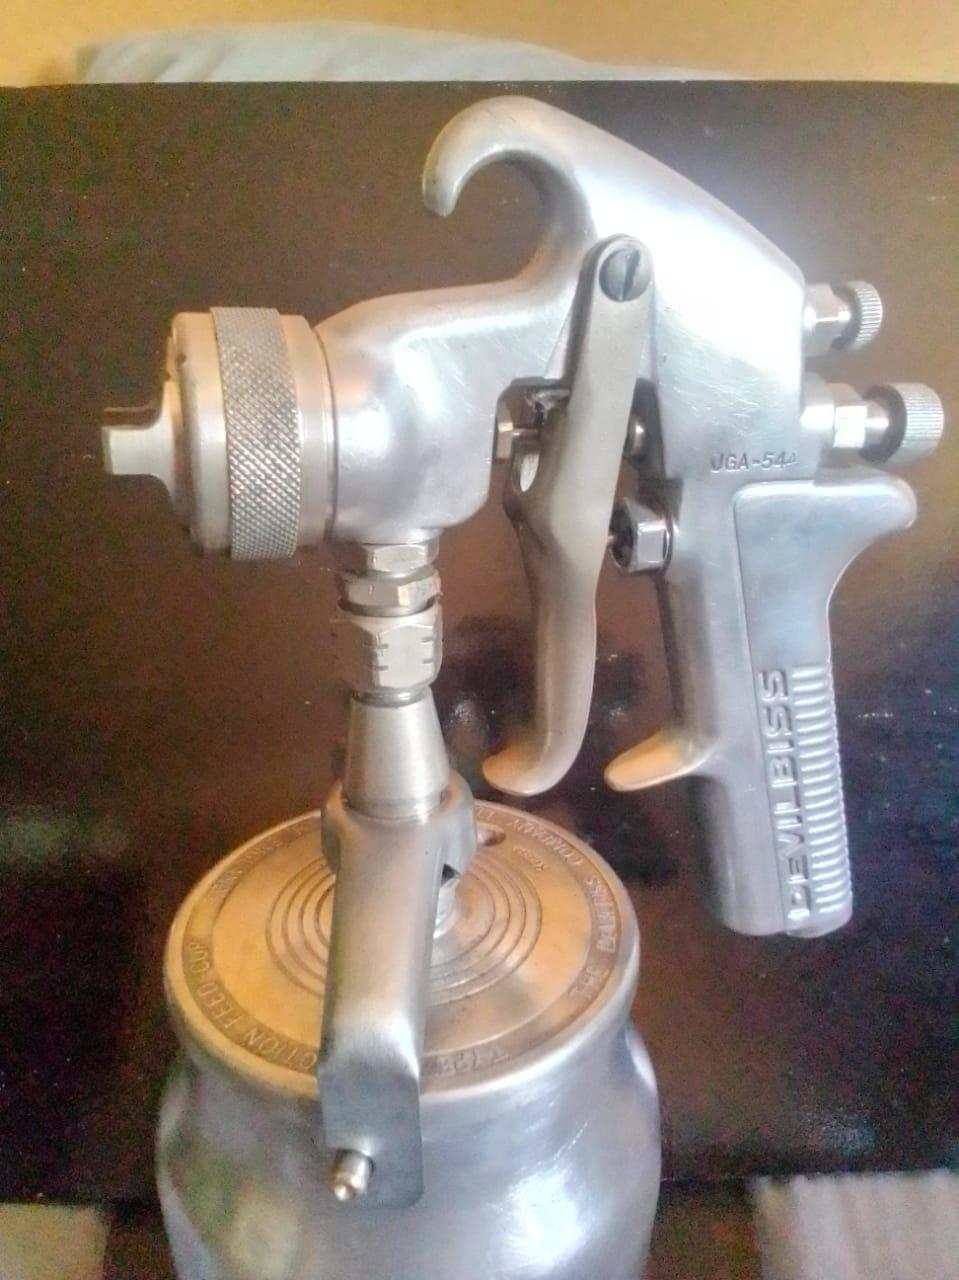 Devilbiss JGA spray gun with pot